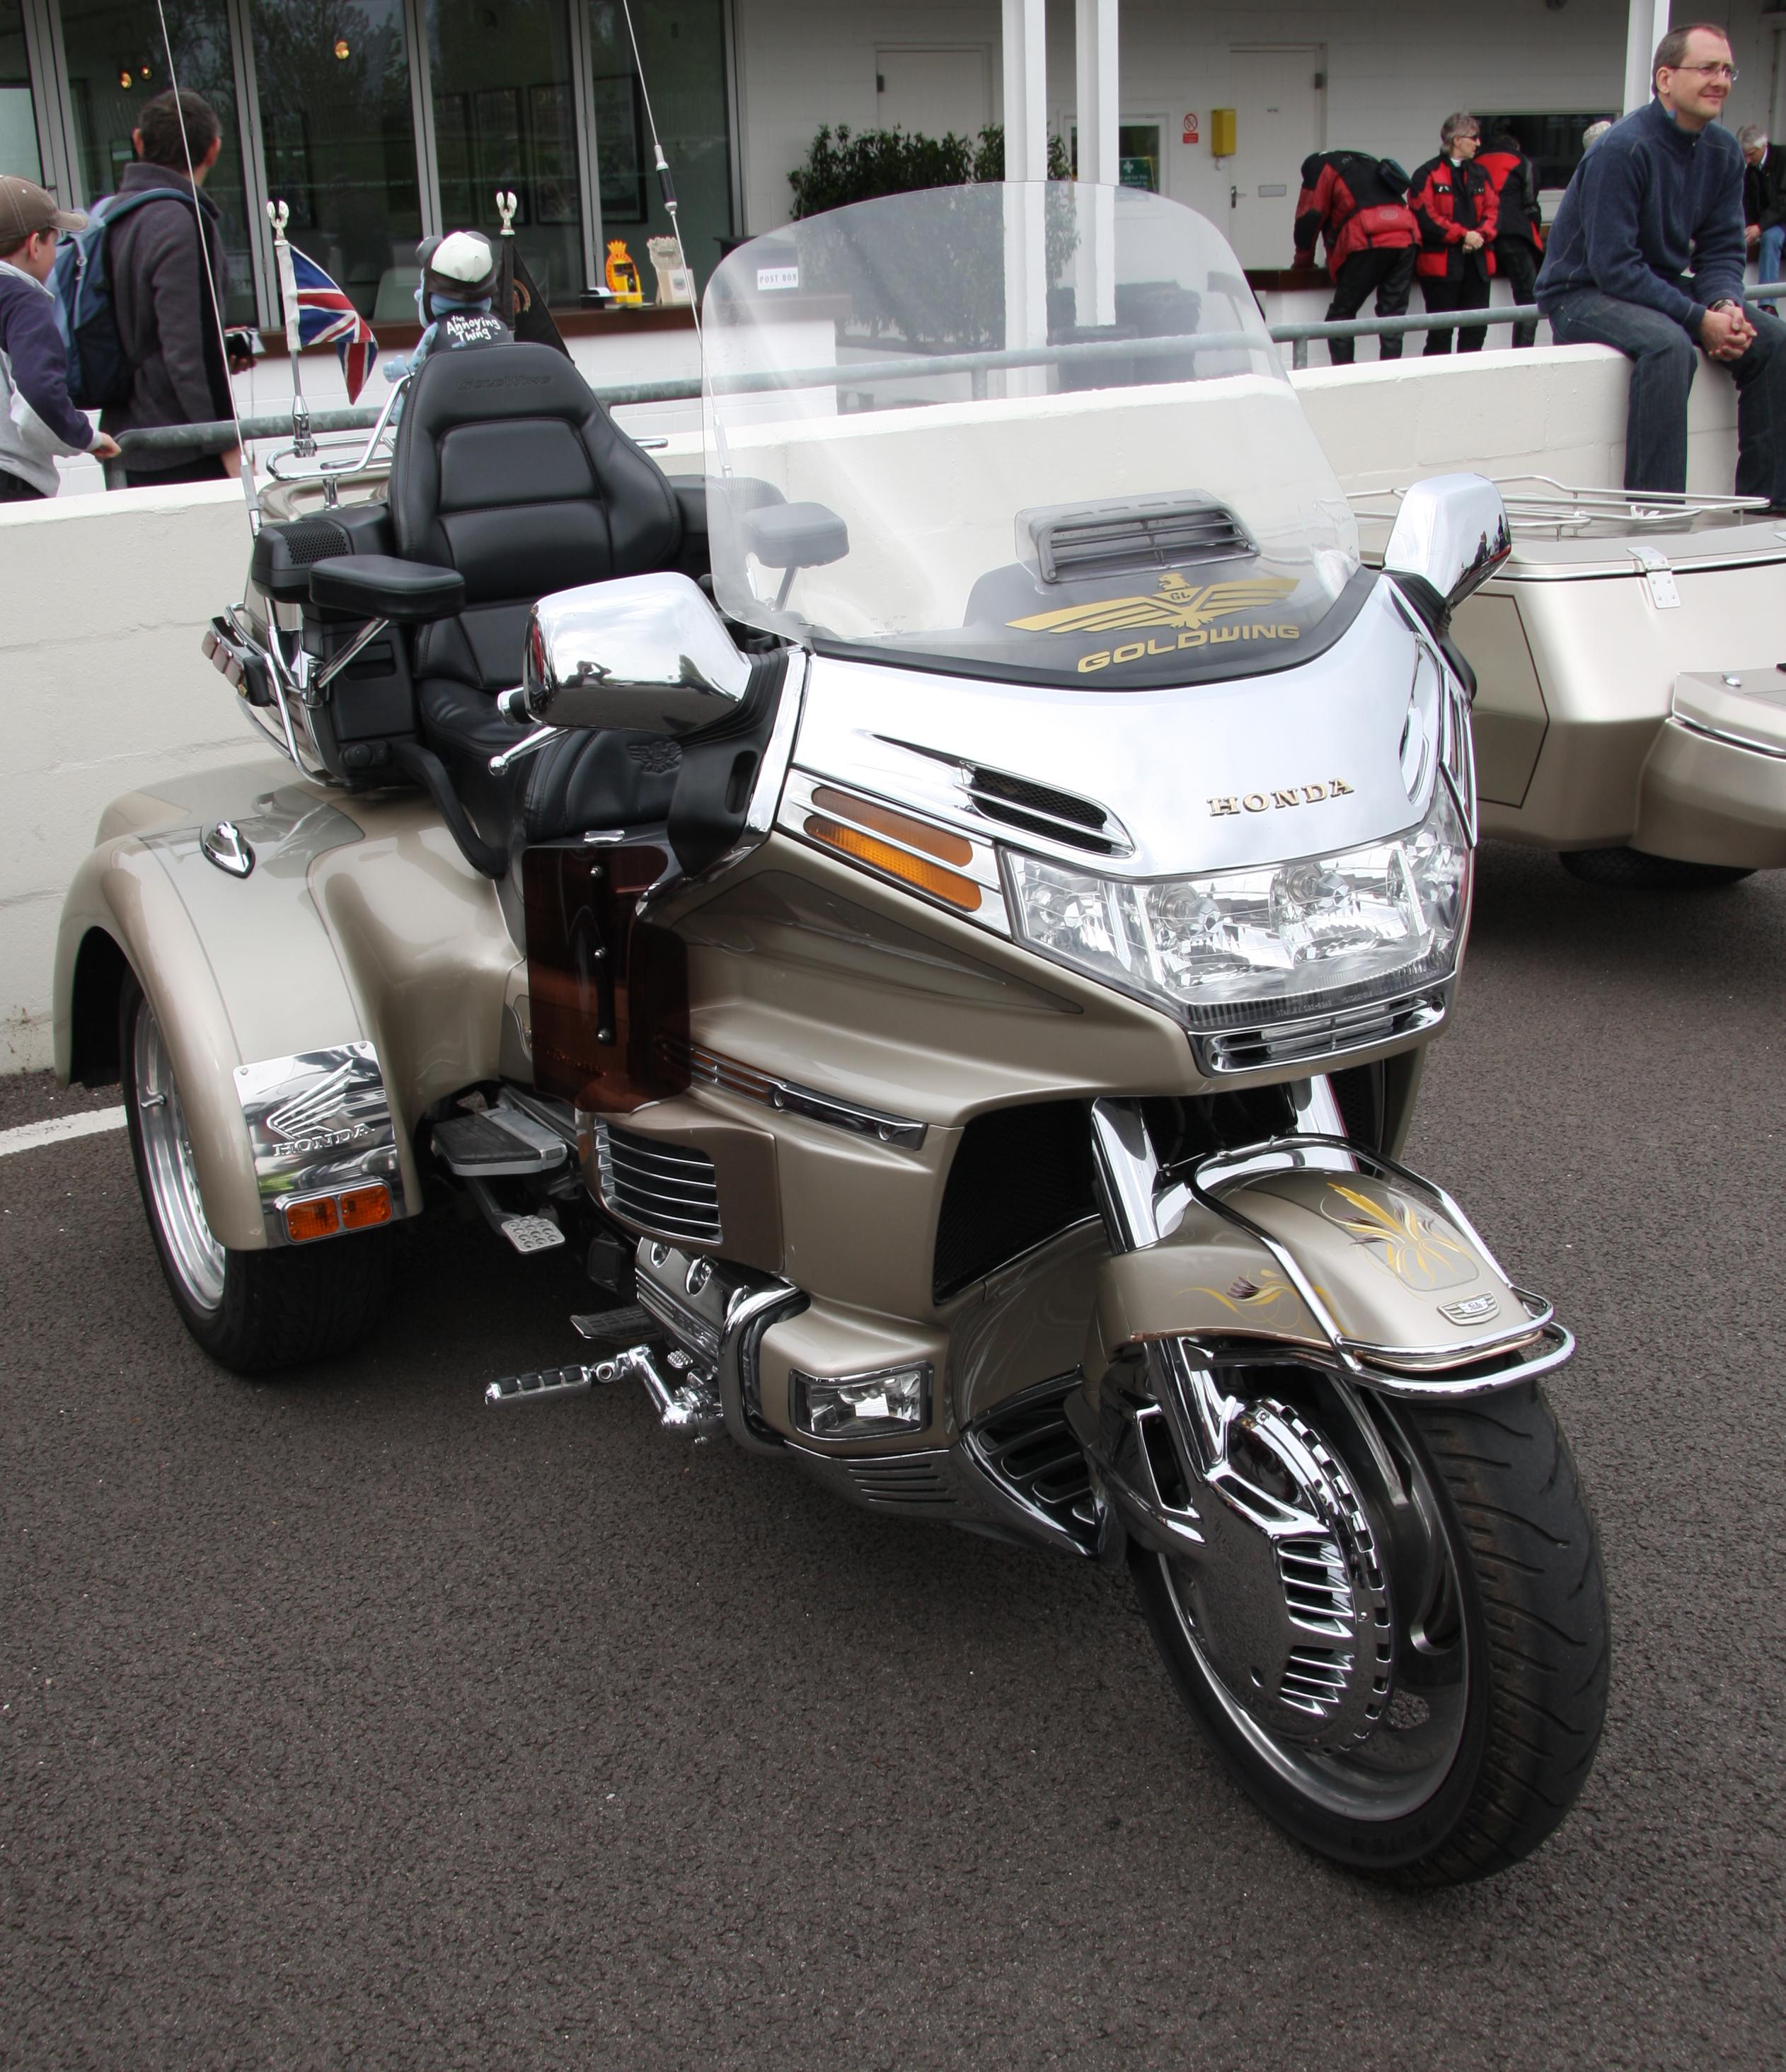 File:Honda Goldwing gold trike front.jpg - Wikimedia Commons